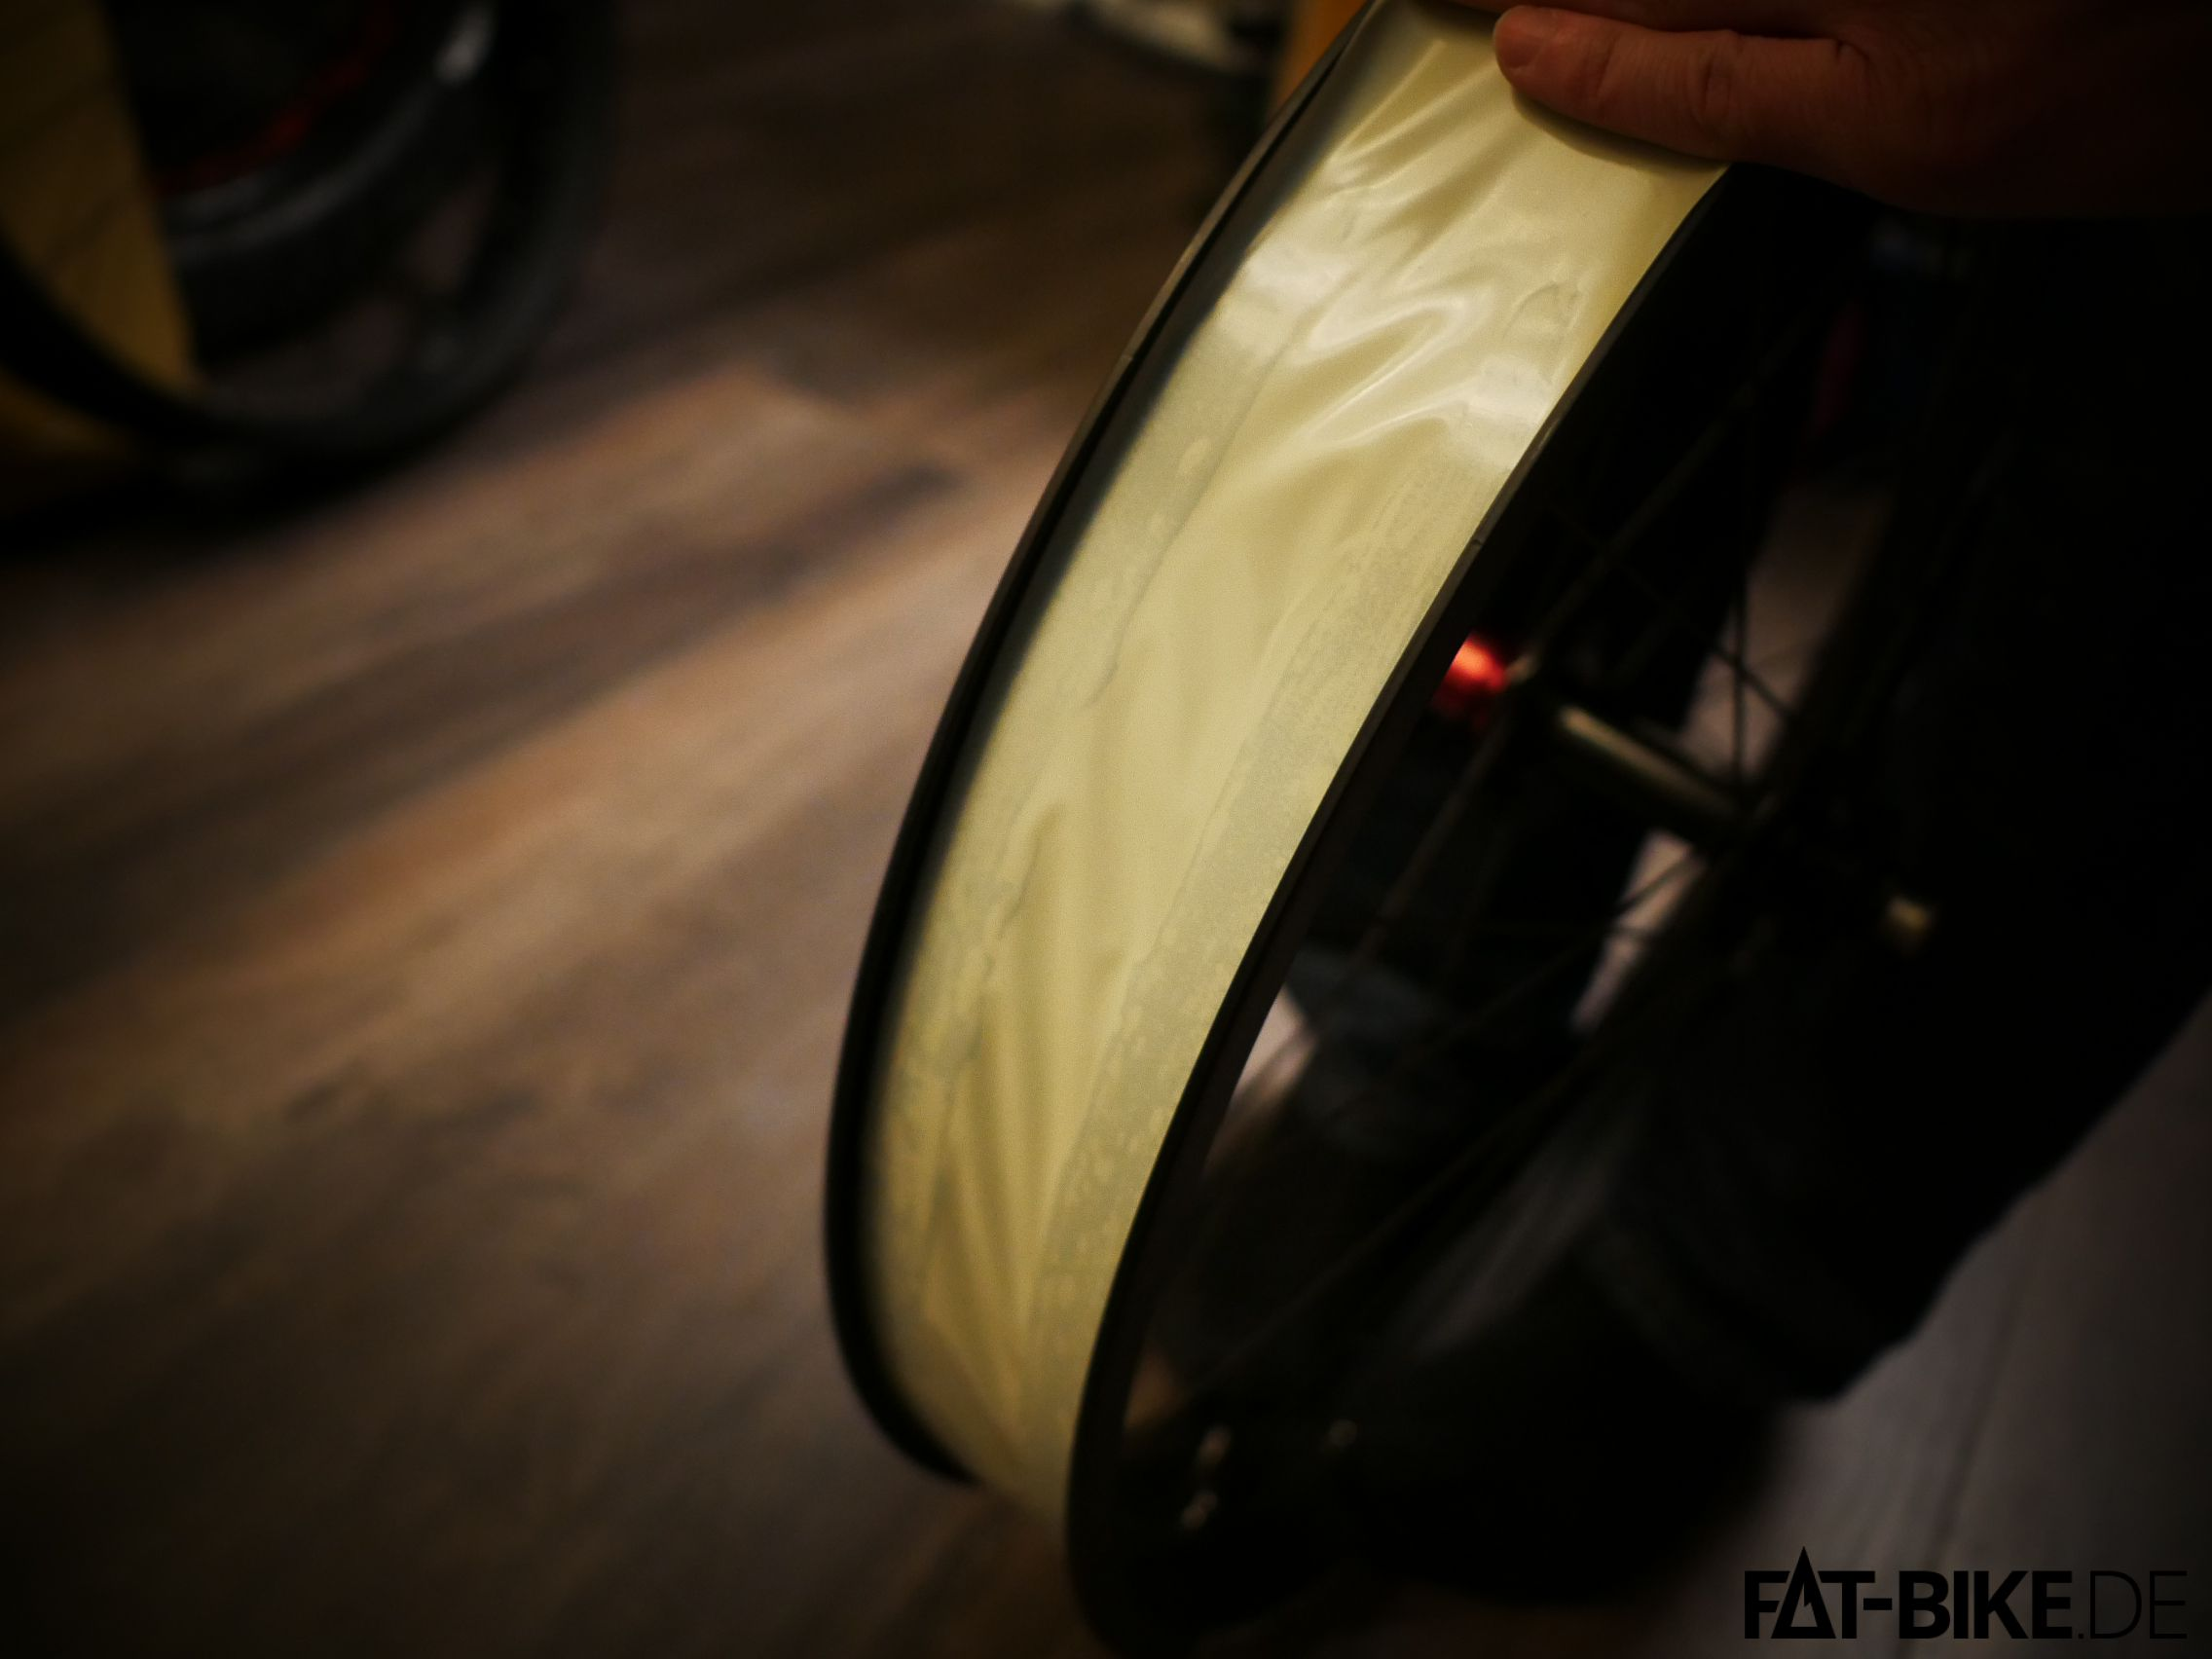 Frisch umgerüstet: Sun Ringle Tubeless Tape im Einsatz